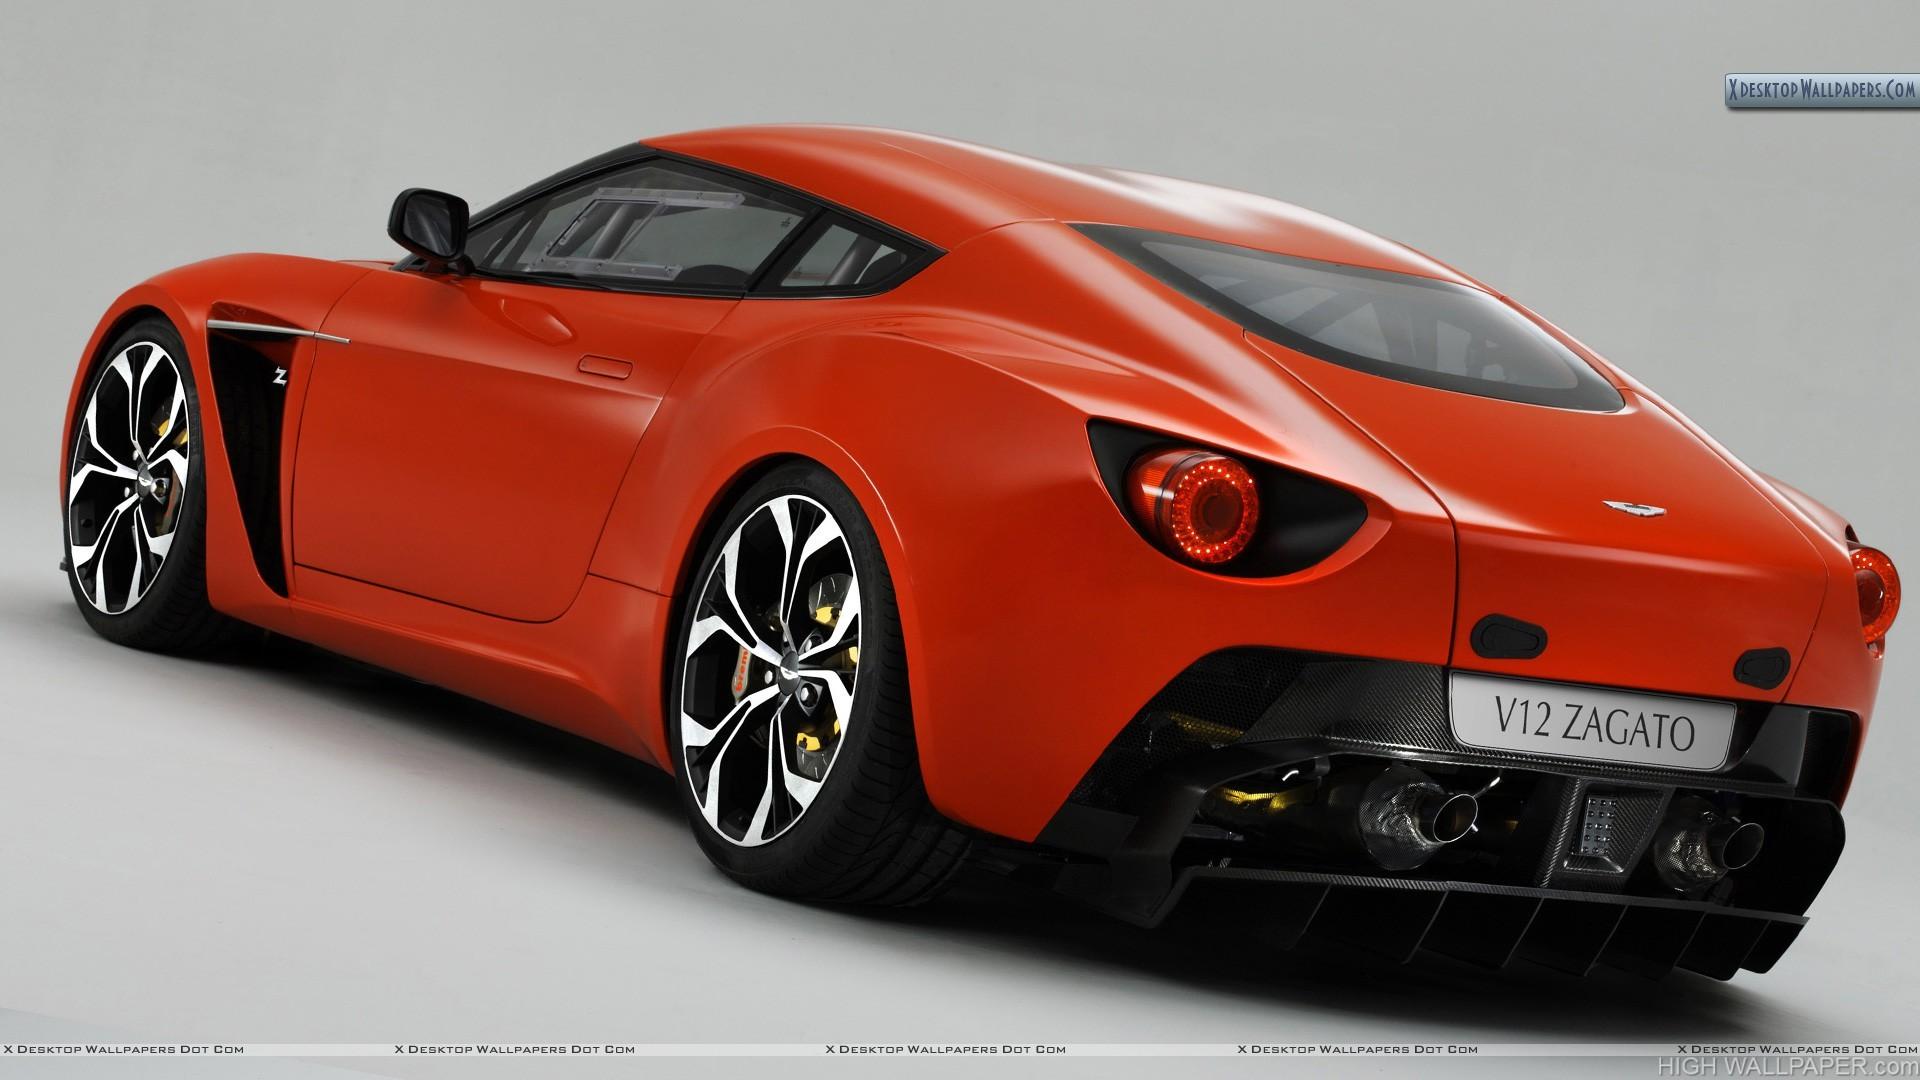 Red Color 2011 Aston Martin V12 Zagato Back Pose